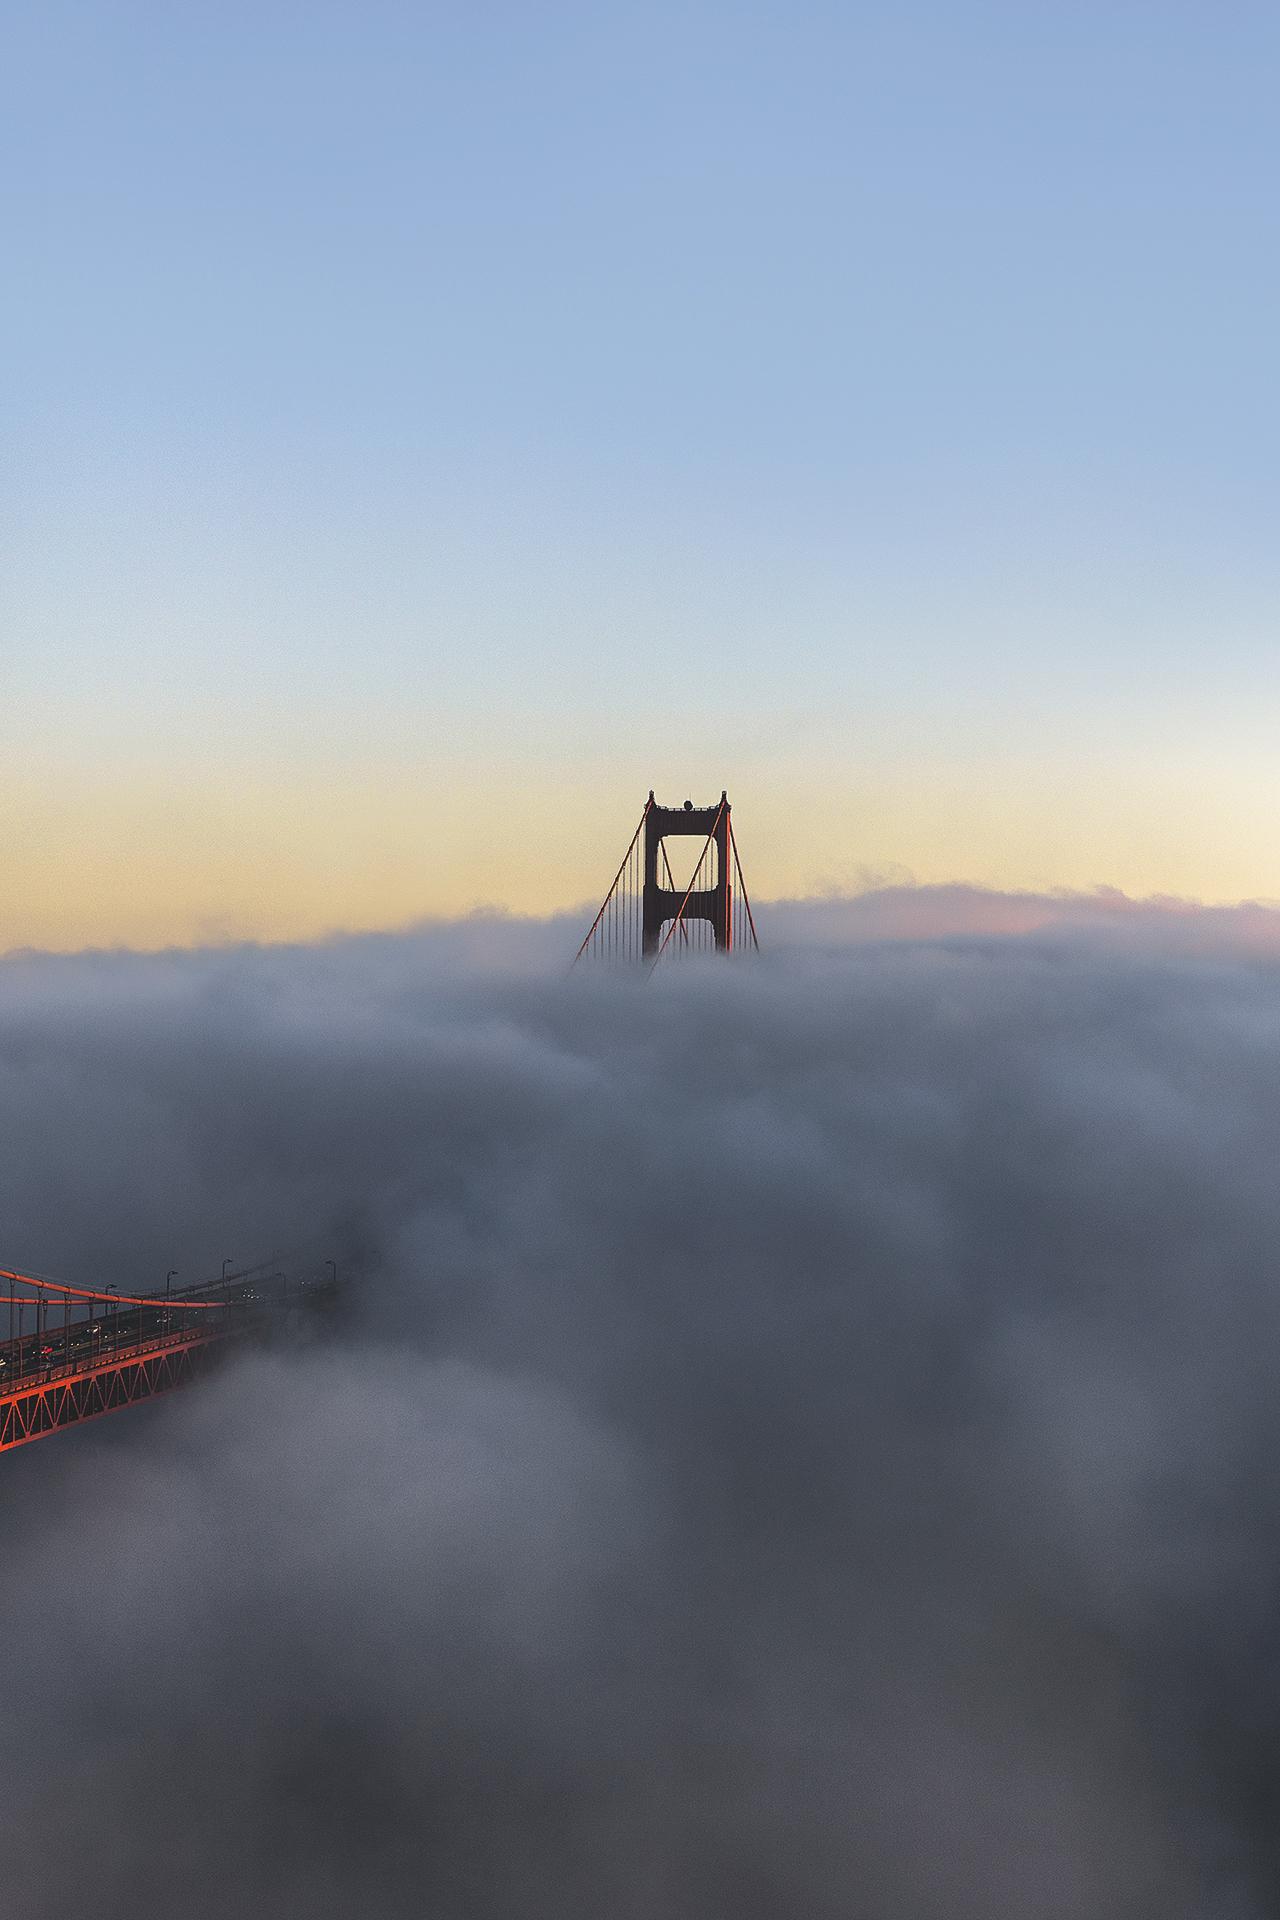 More Than Just Photos 654 - Golden Gate Bridge